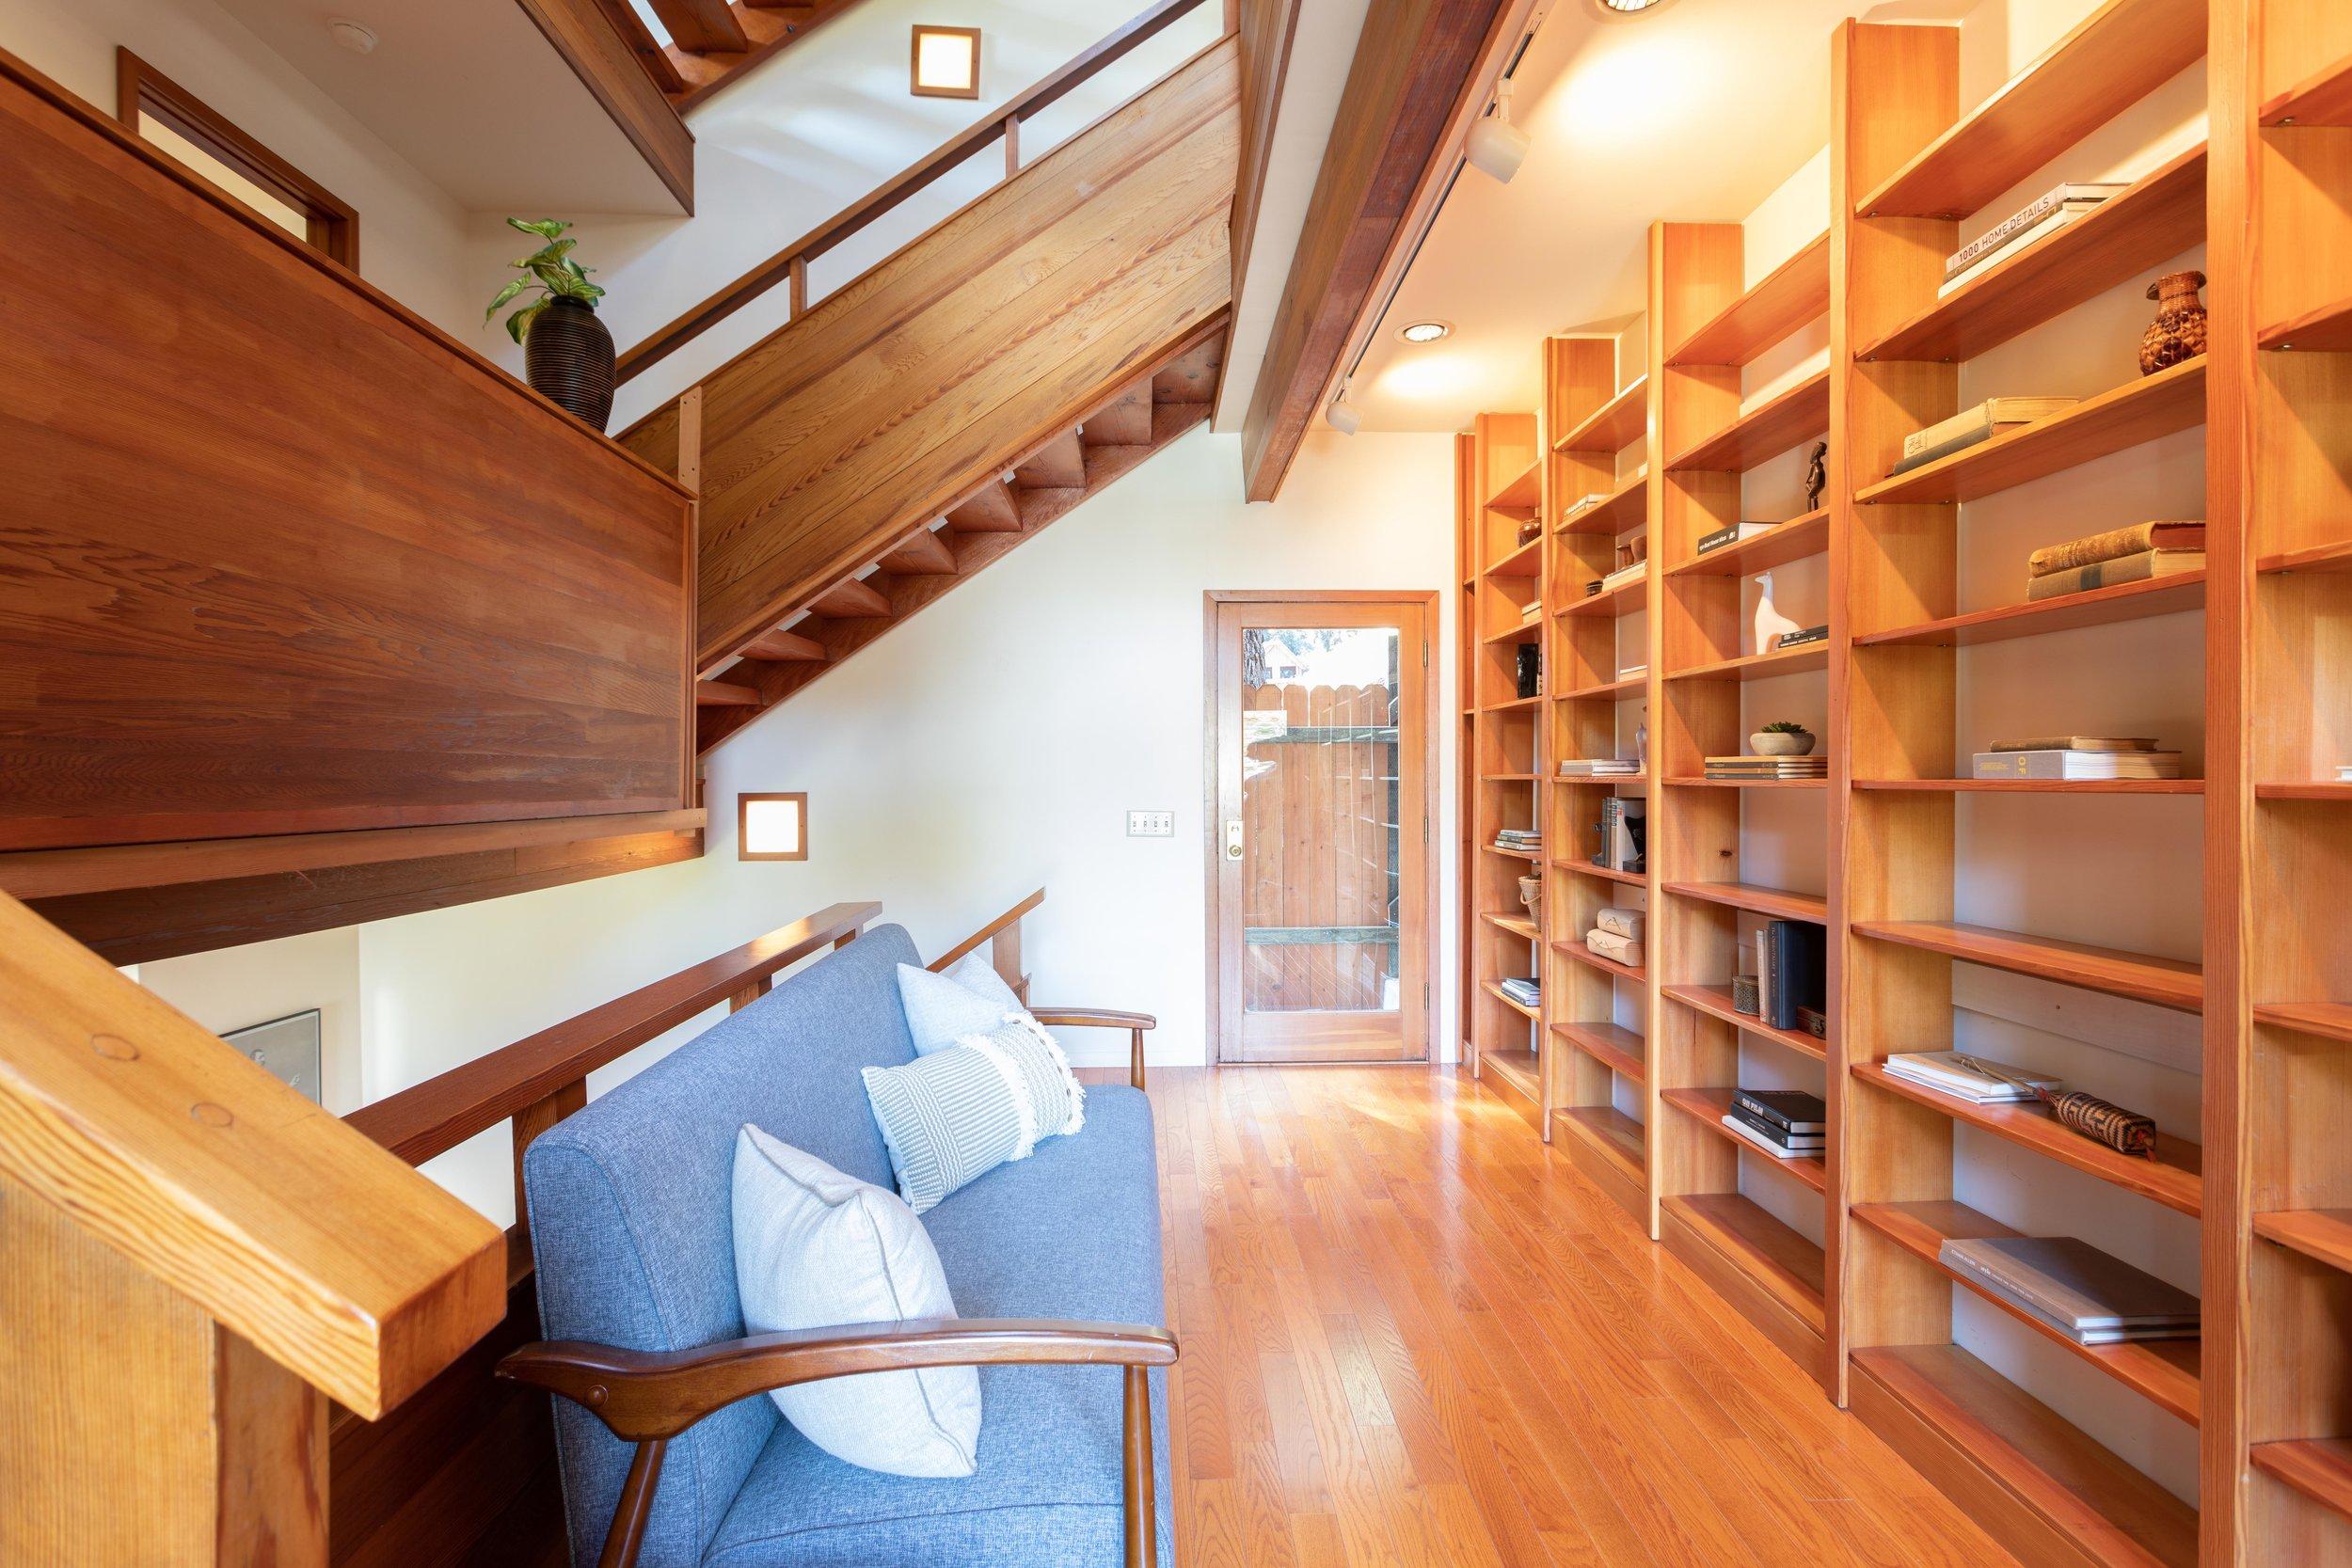 2353 Stanley Hills Dr - VirtuallyHereStudios.com-42.jpg